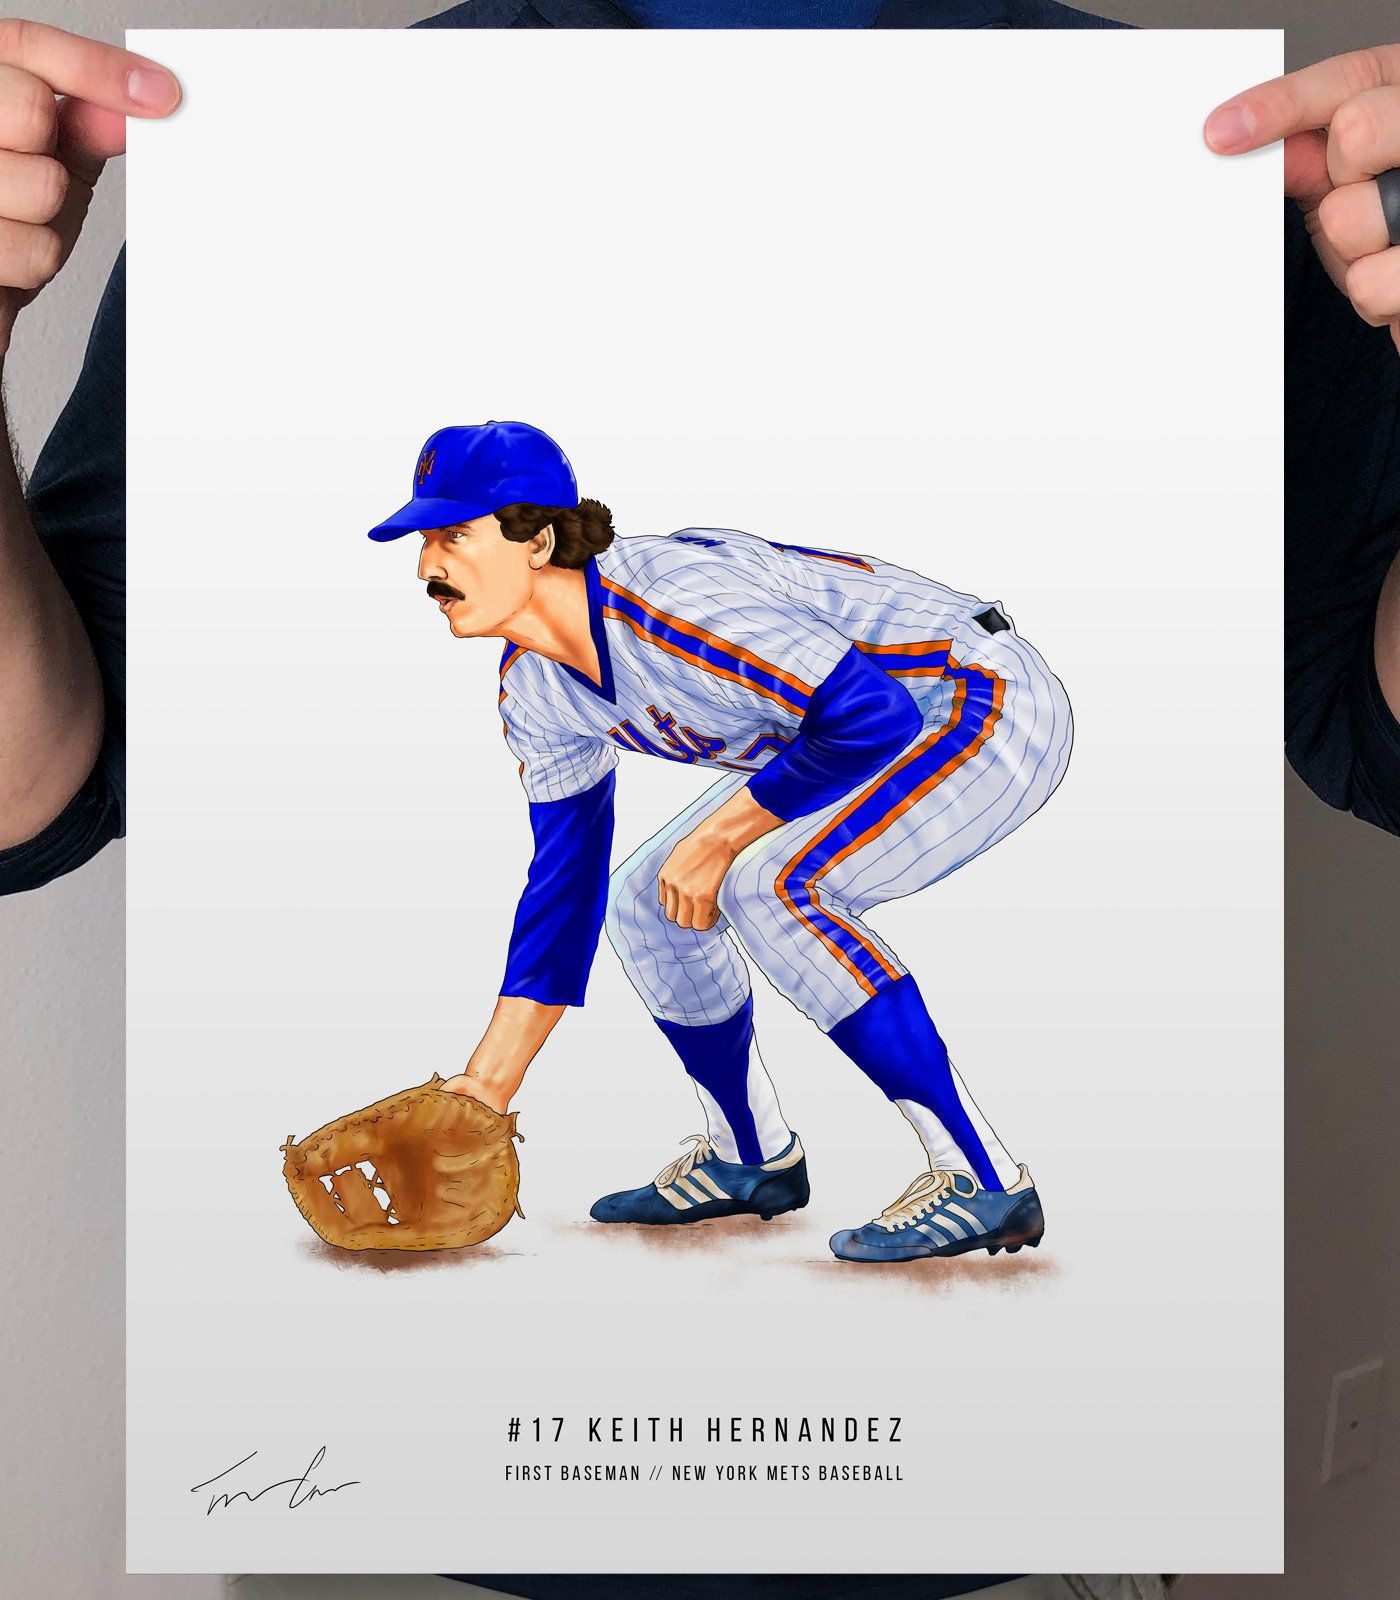 Keith Hernandez 1986 New York Mets Baseball Illustrated